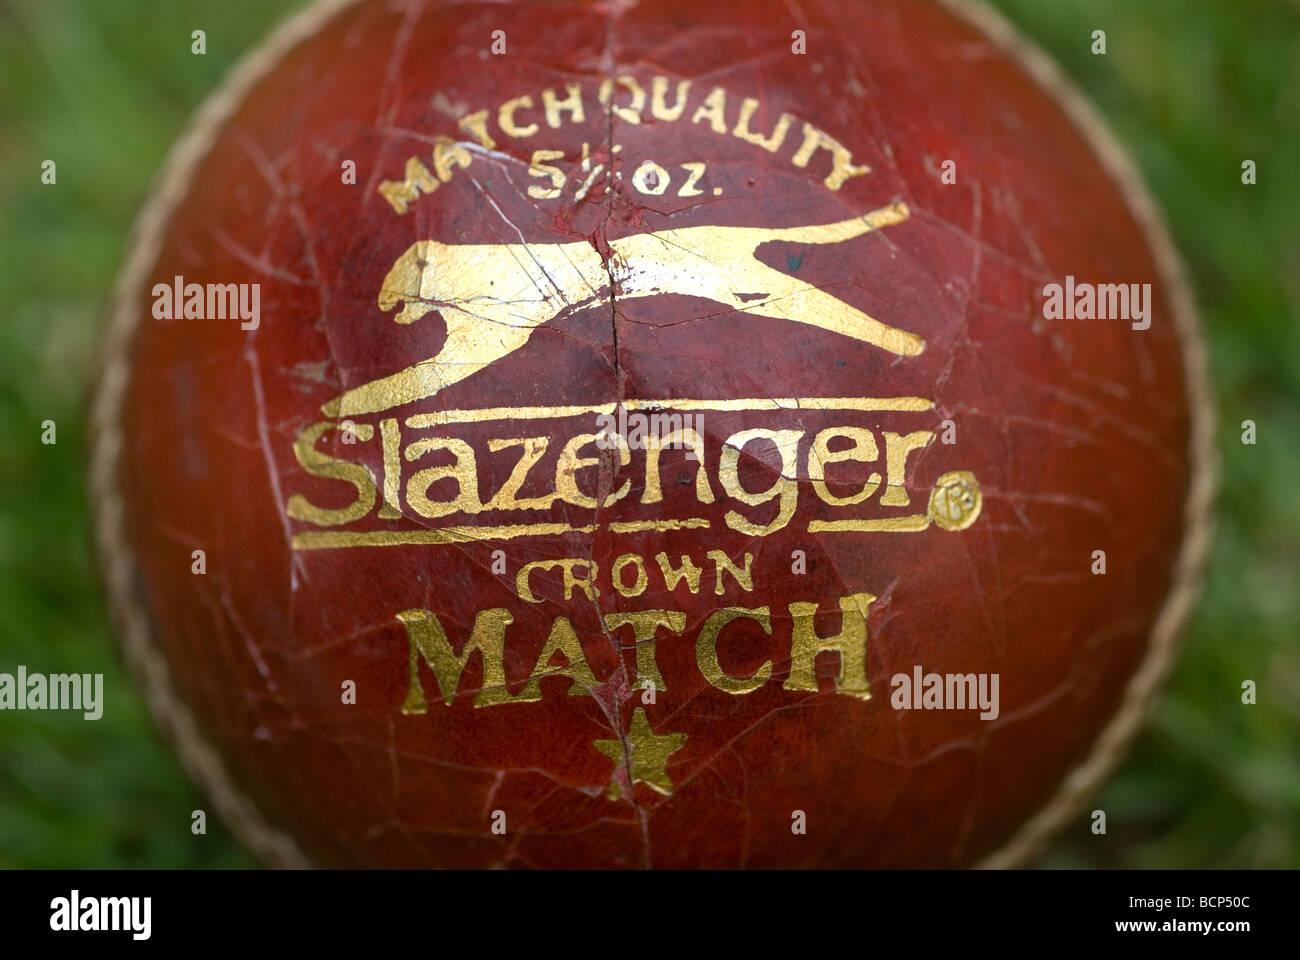 2a6479fef27 Slazenger crown Match cricket ball,5 oz Stock Photo: 25073116 - Alamy